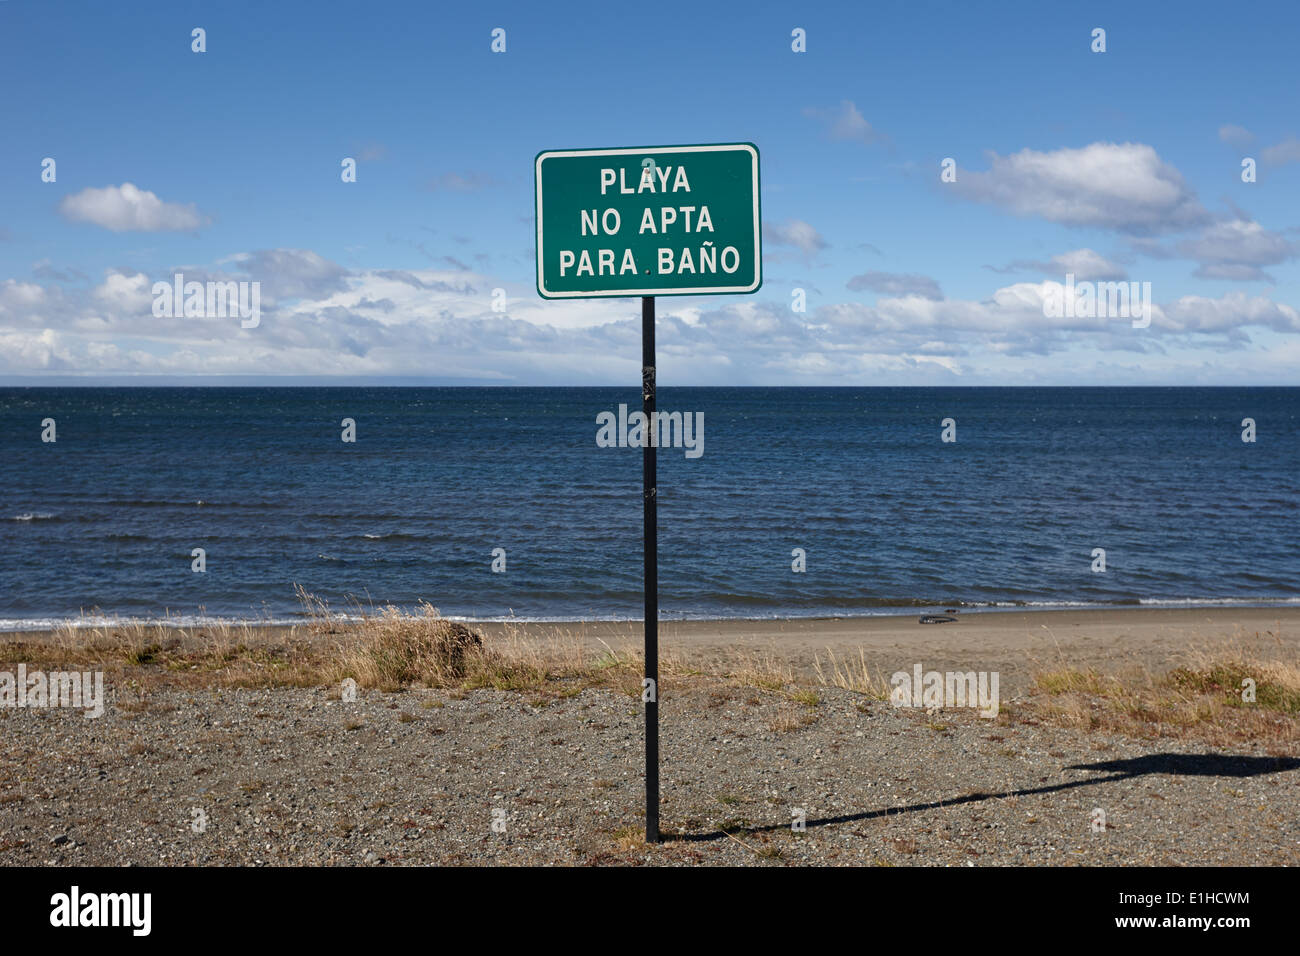 playa no apta para bano unsuitable for swimming strait of magellan coastal shoreline in Punta Arenas Chile - Stock Image